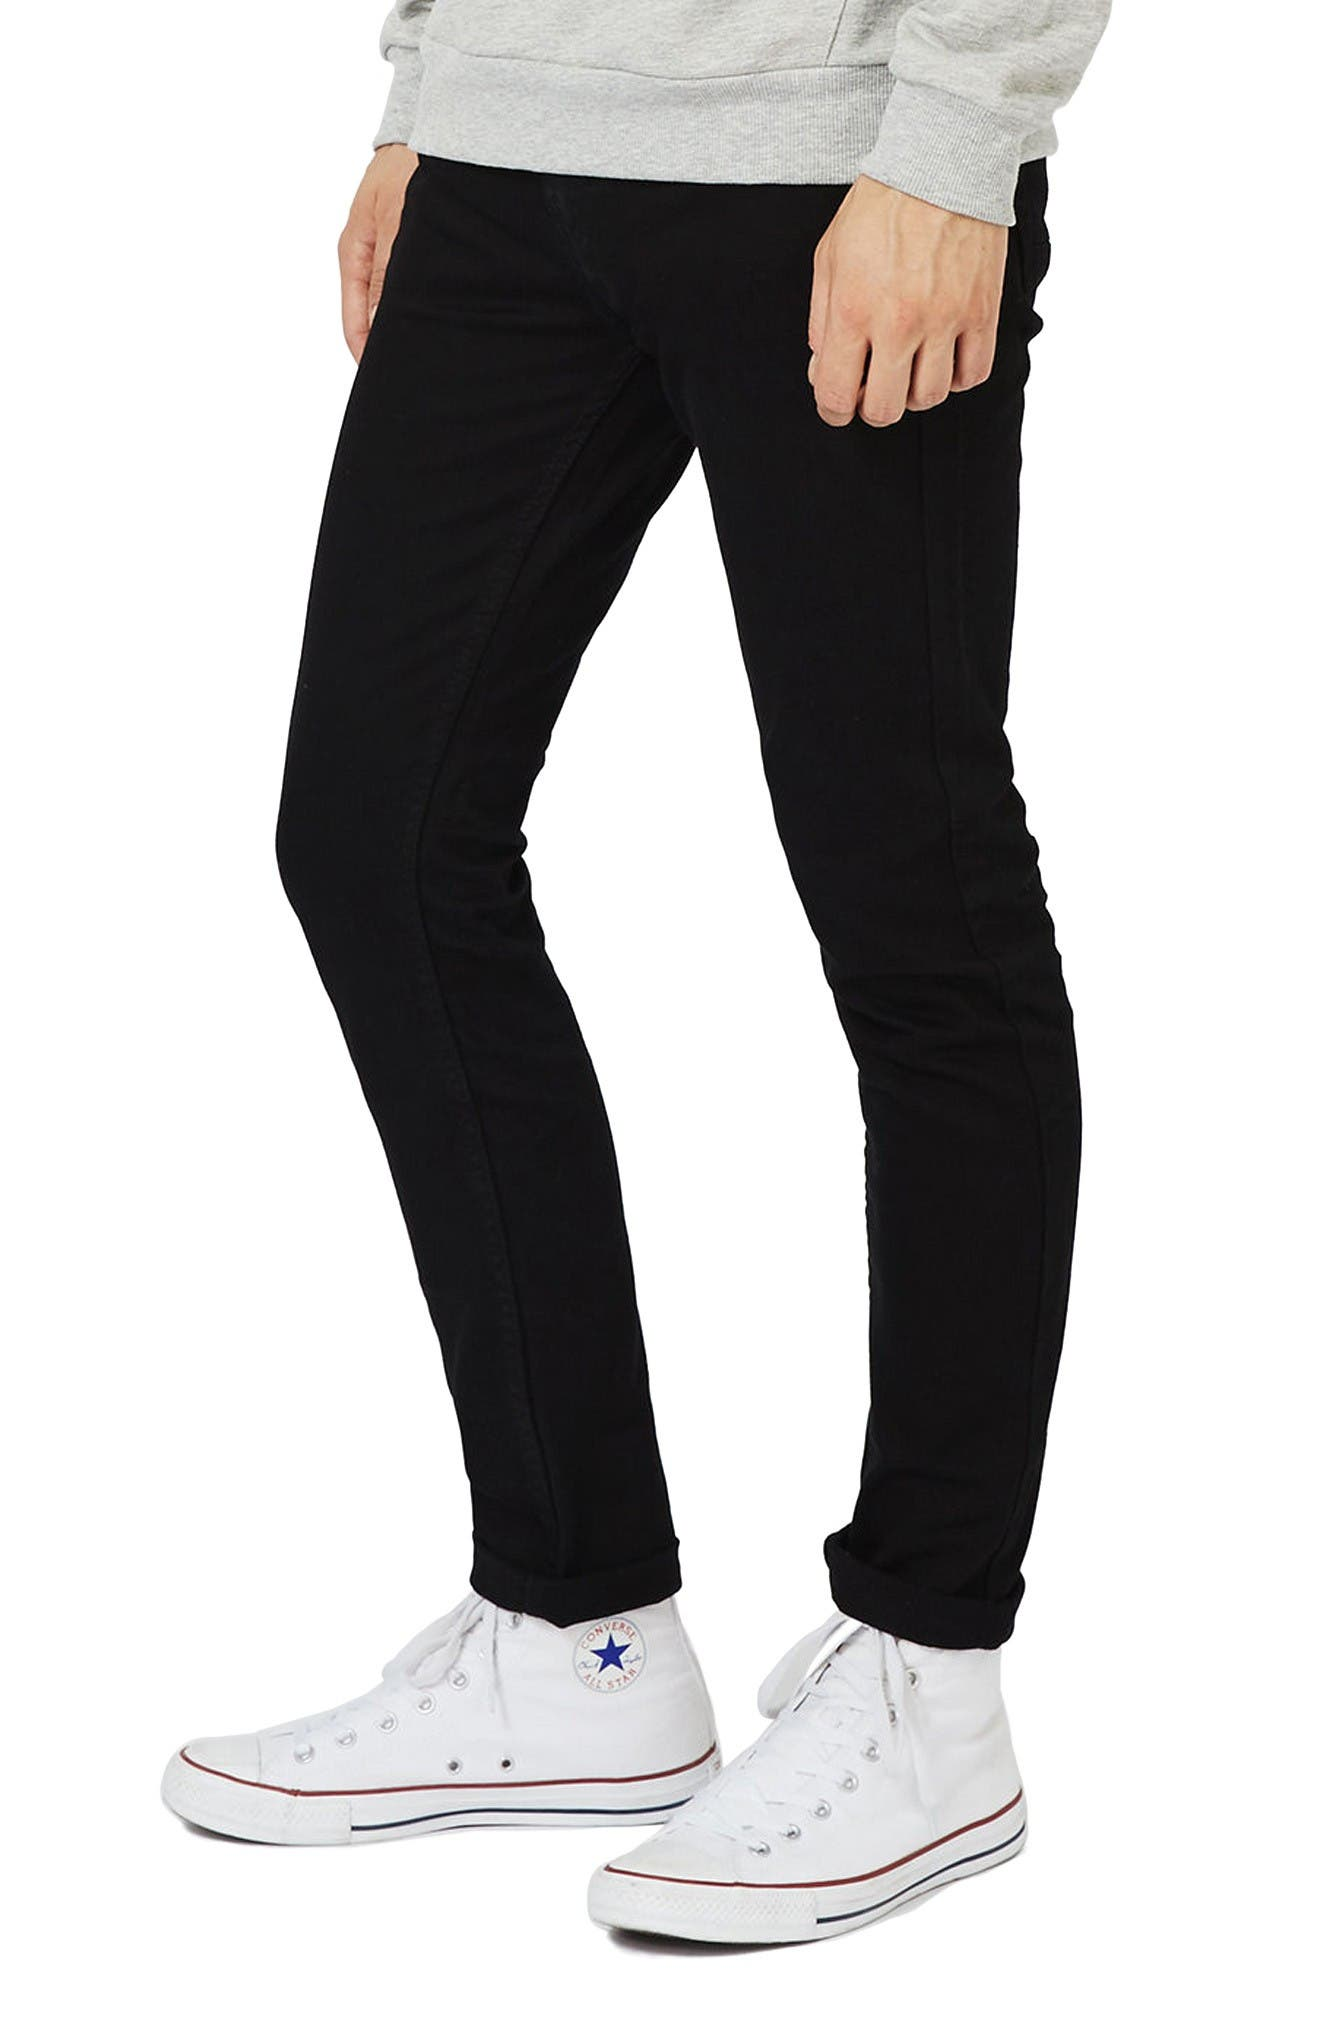 Skinny Stretch Jeans,                         Main,                         color, Black